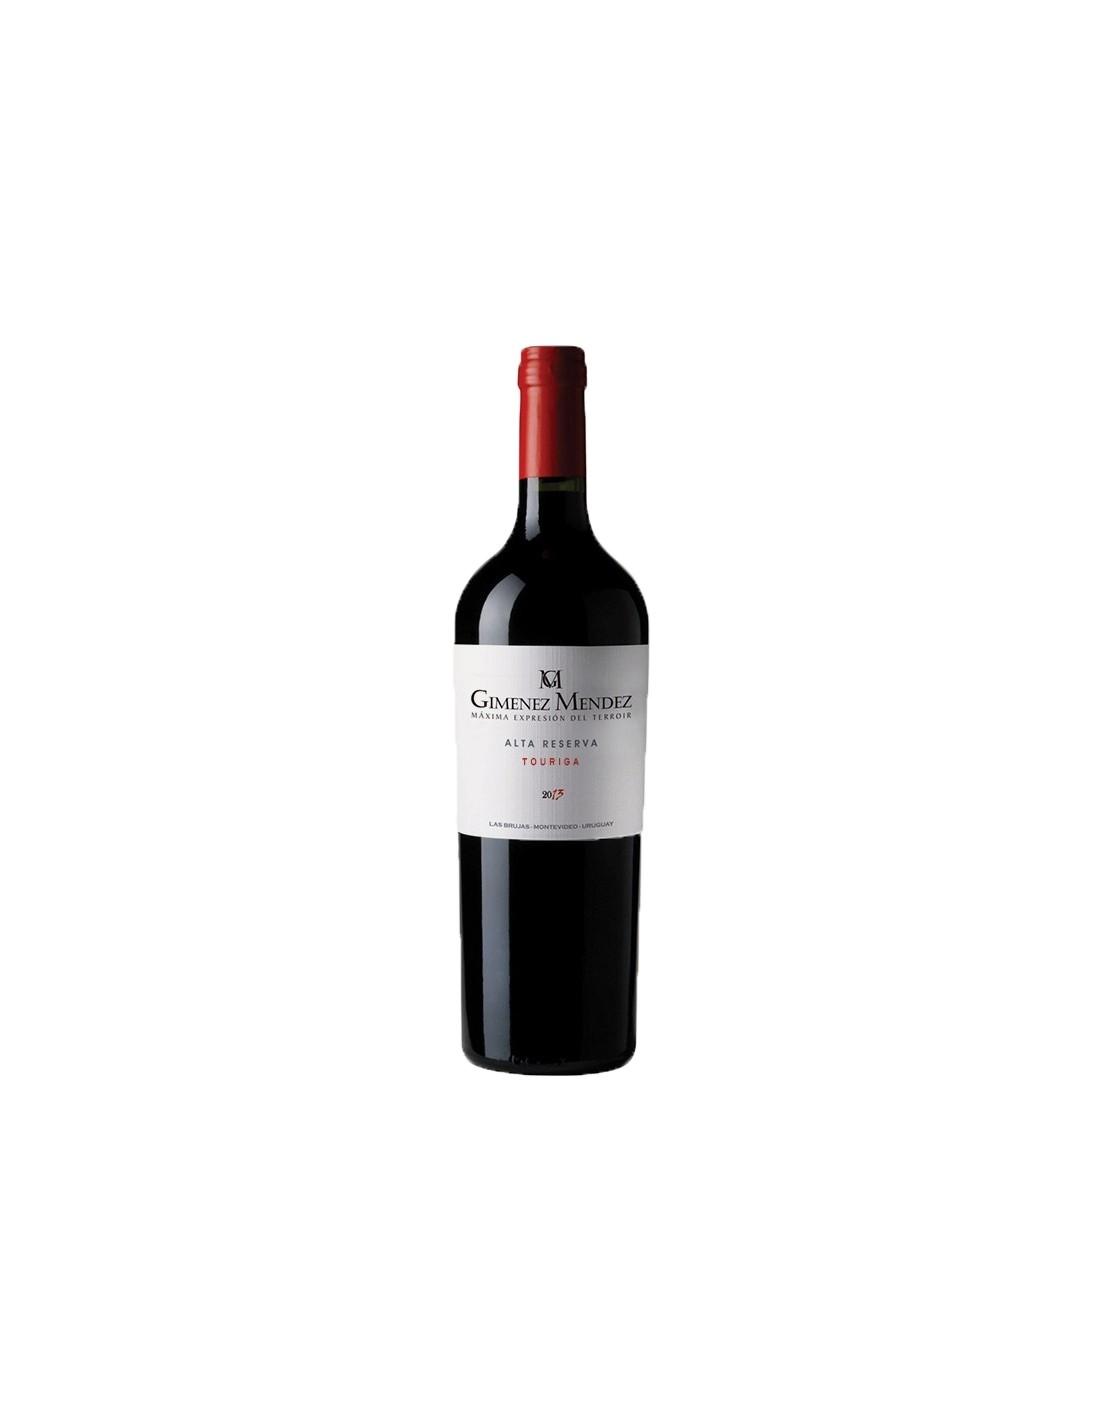 Vin rosu, Touriga, Gimenez Mendez Alta Reserva, 0.75L, 14% alc., Uruguay